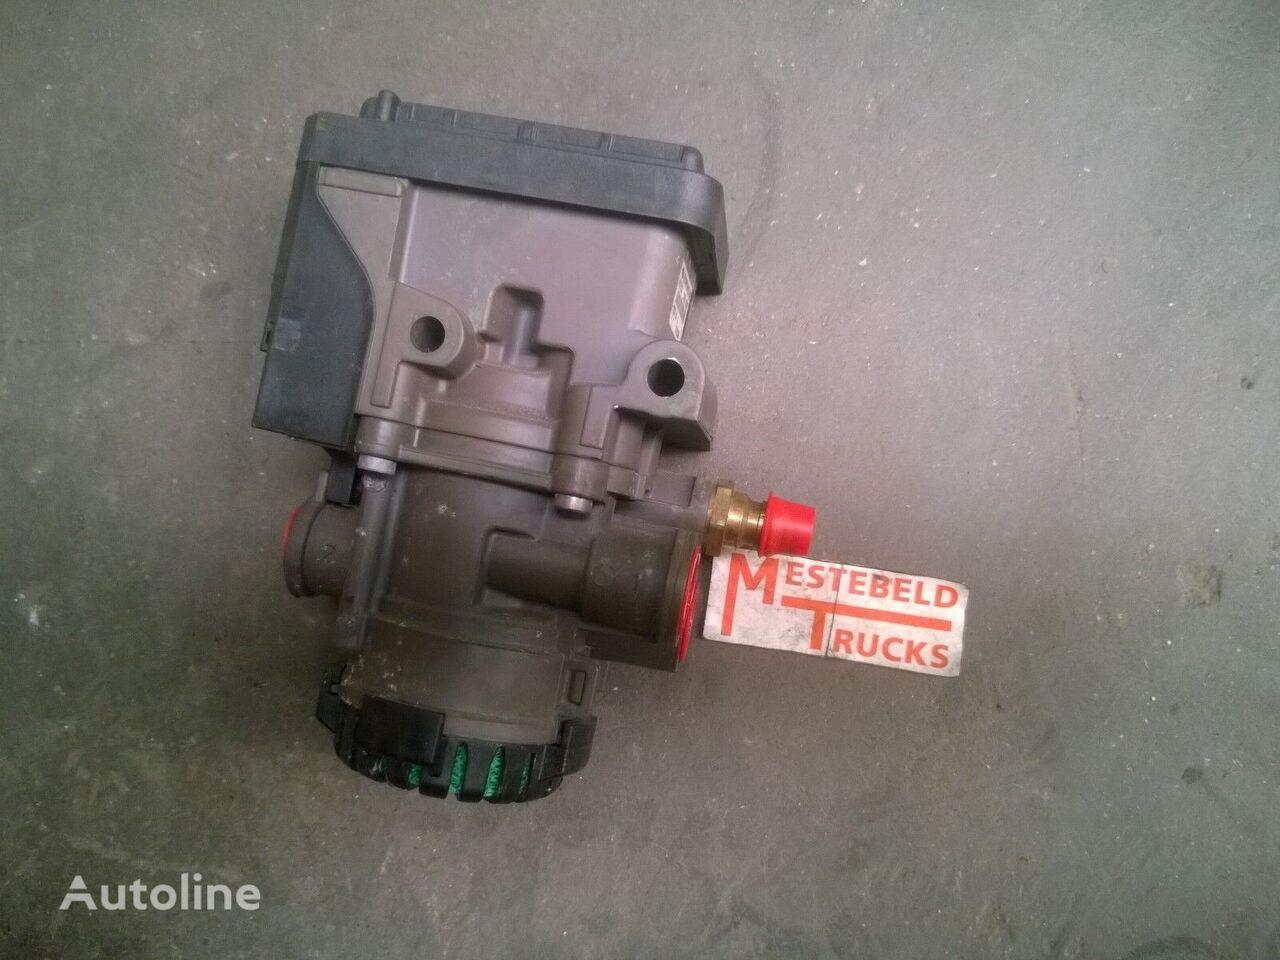 rezervni delovi  EBS Voorasmodulator za kamiona RENAULT EBS Voorasmodulator